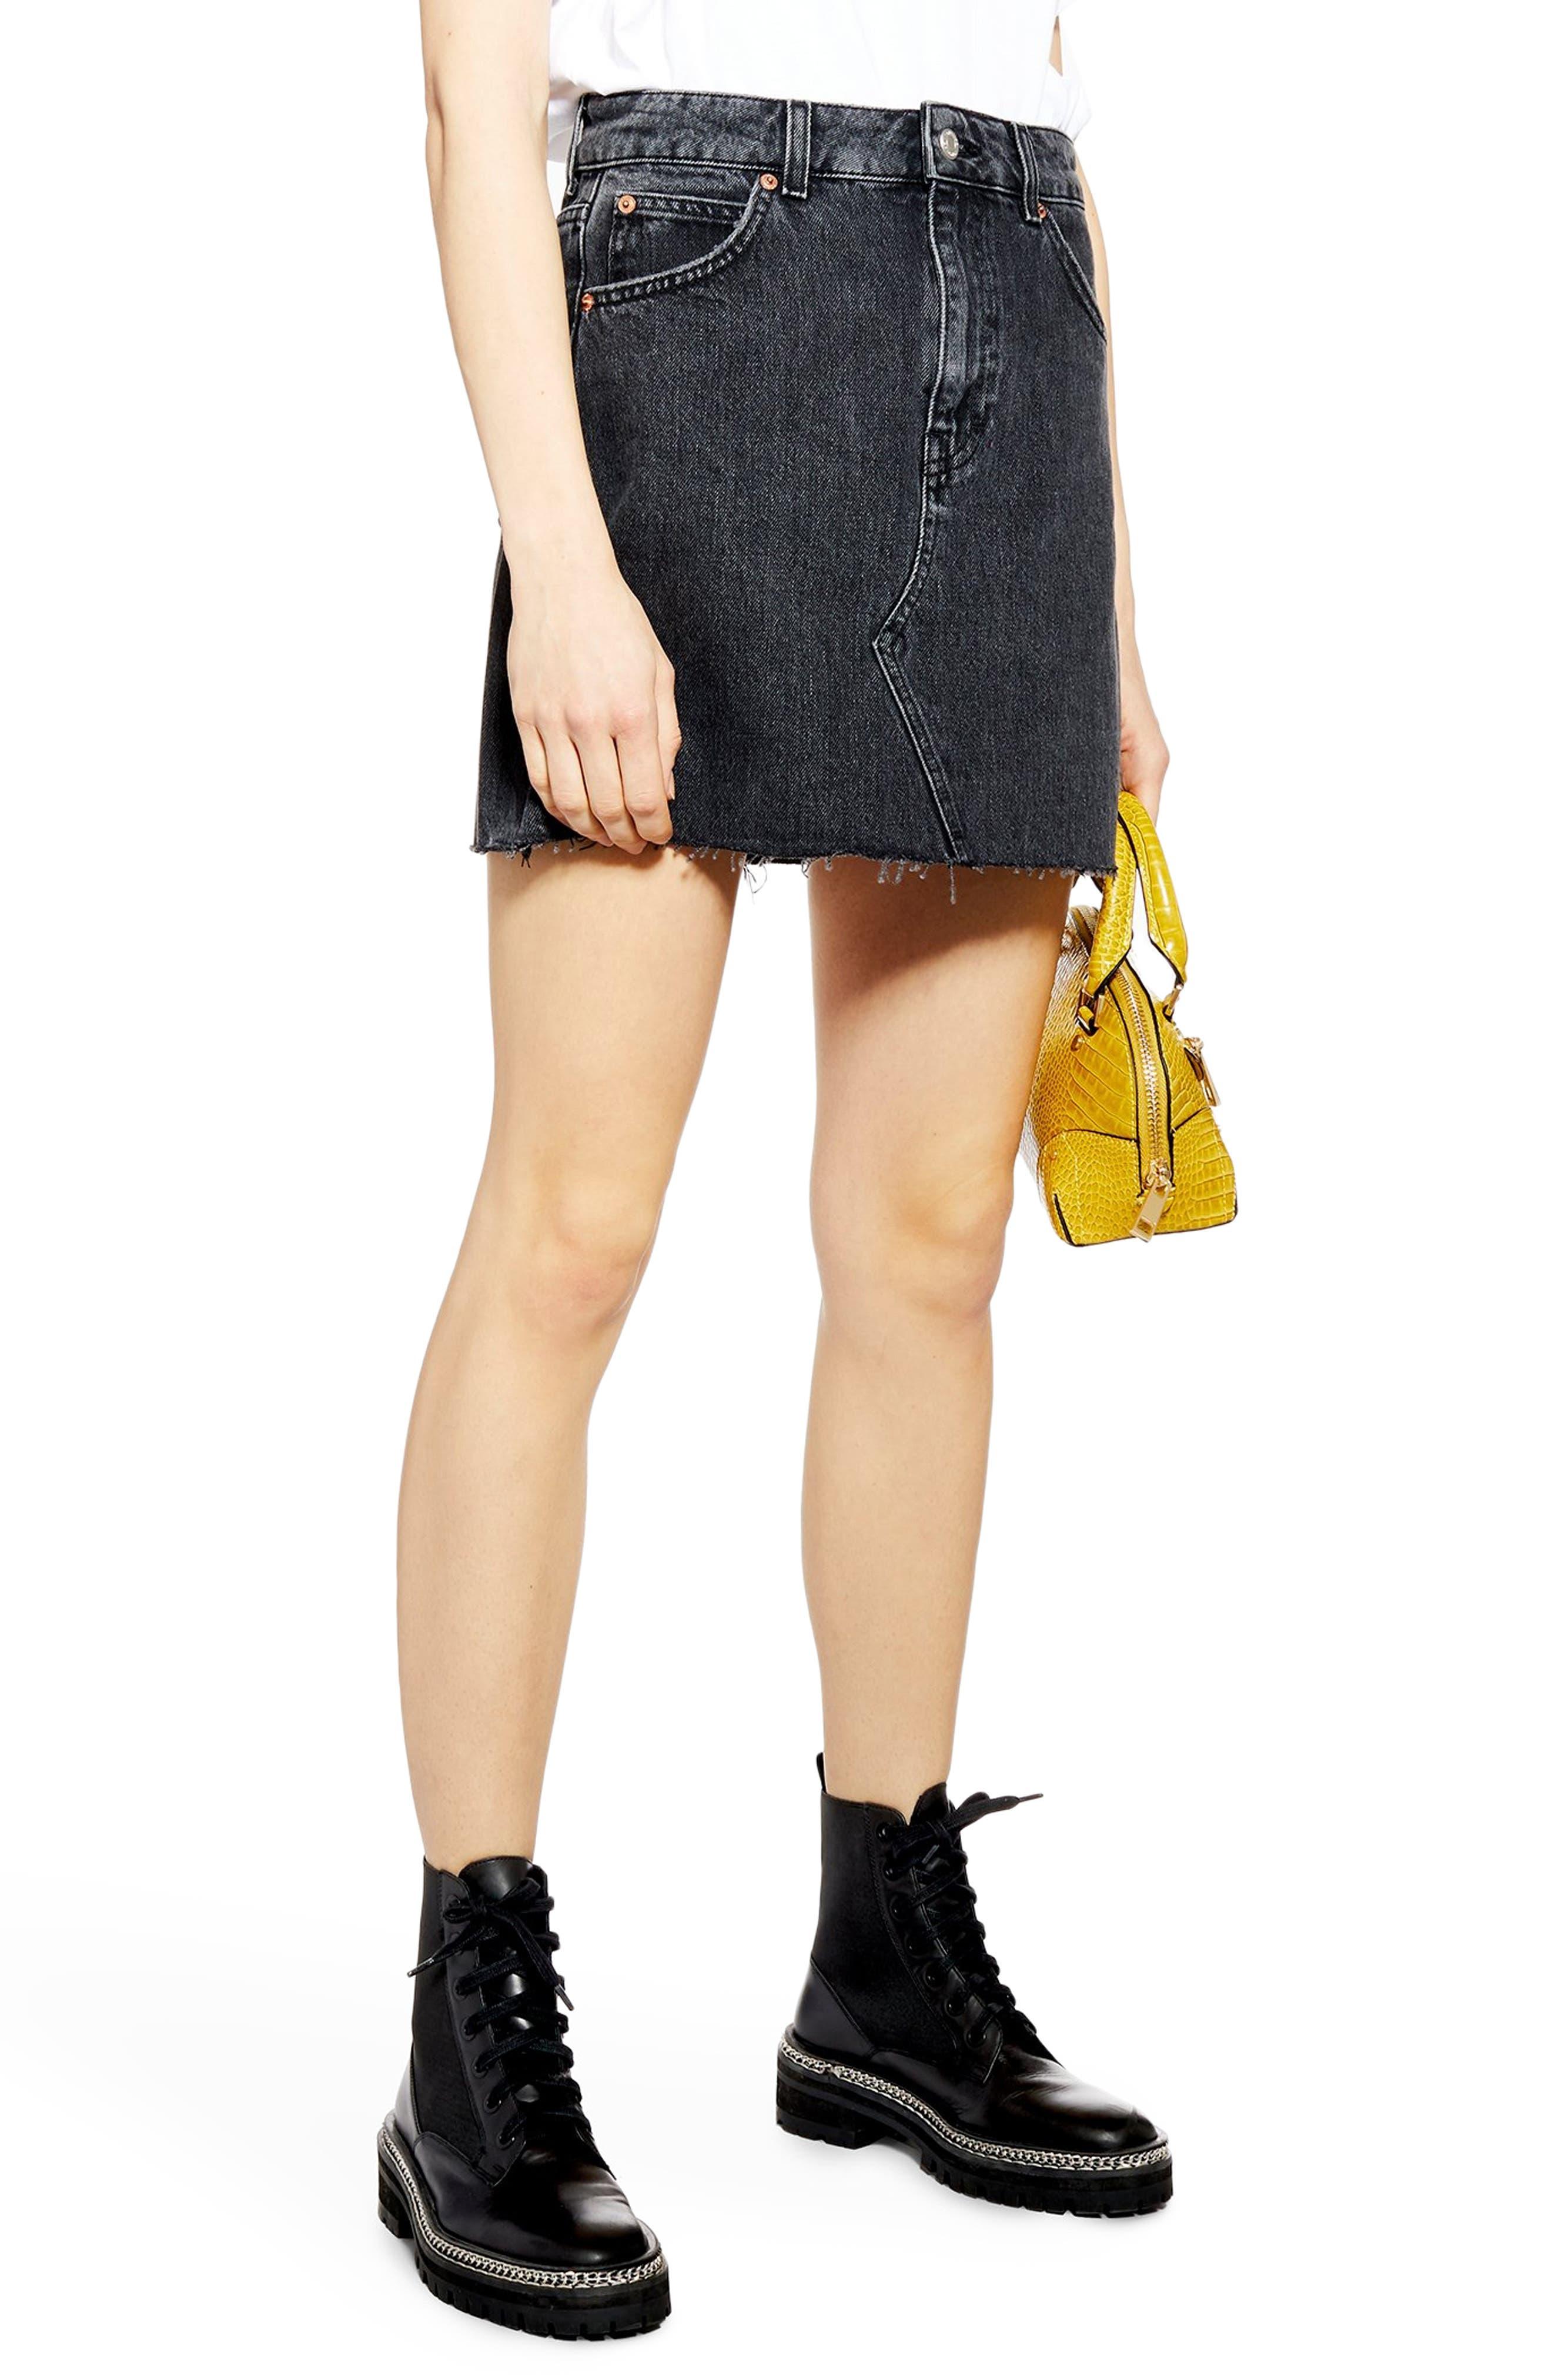 d9e1f28be5 Topshop Black Denim Skirt With Blue Flowers